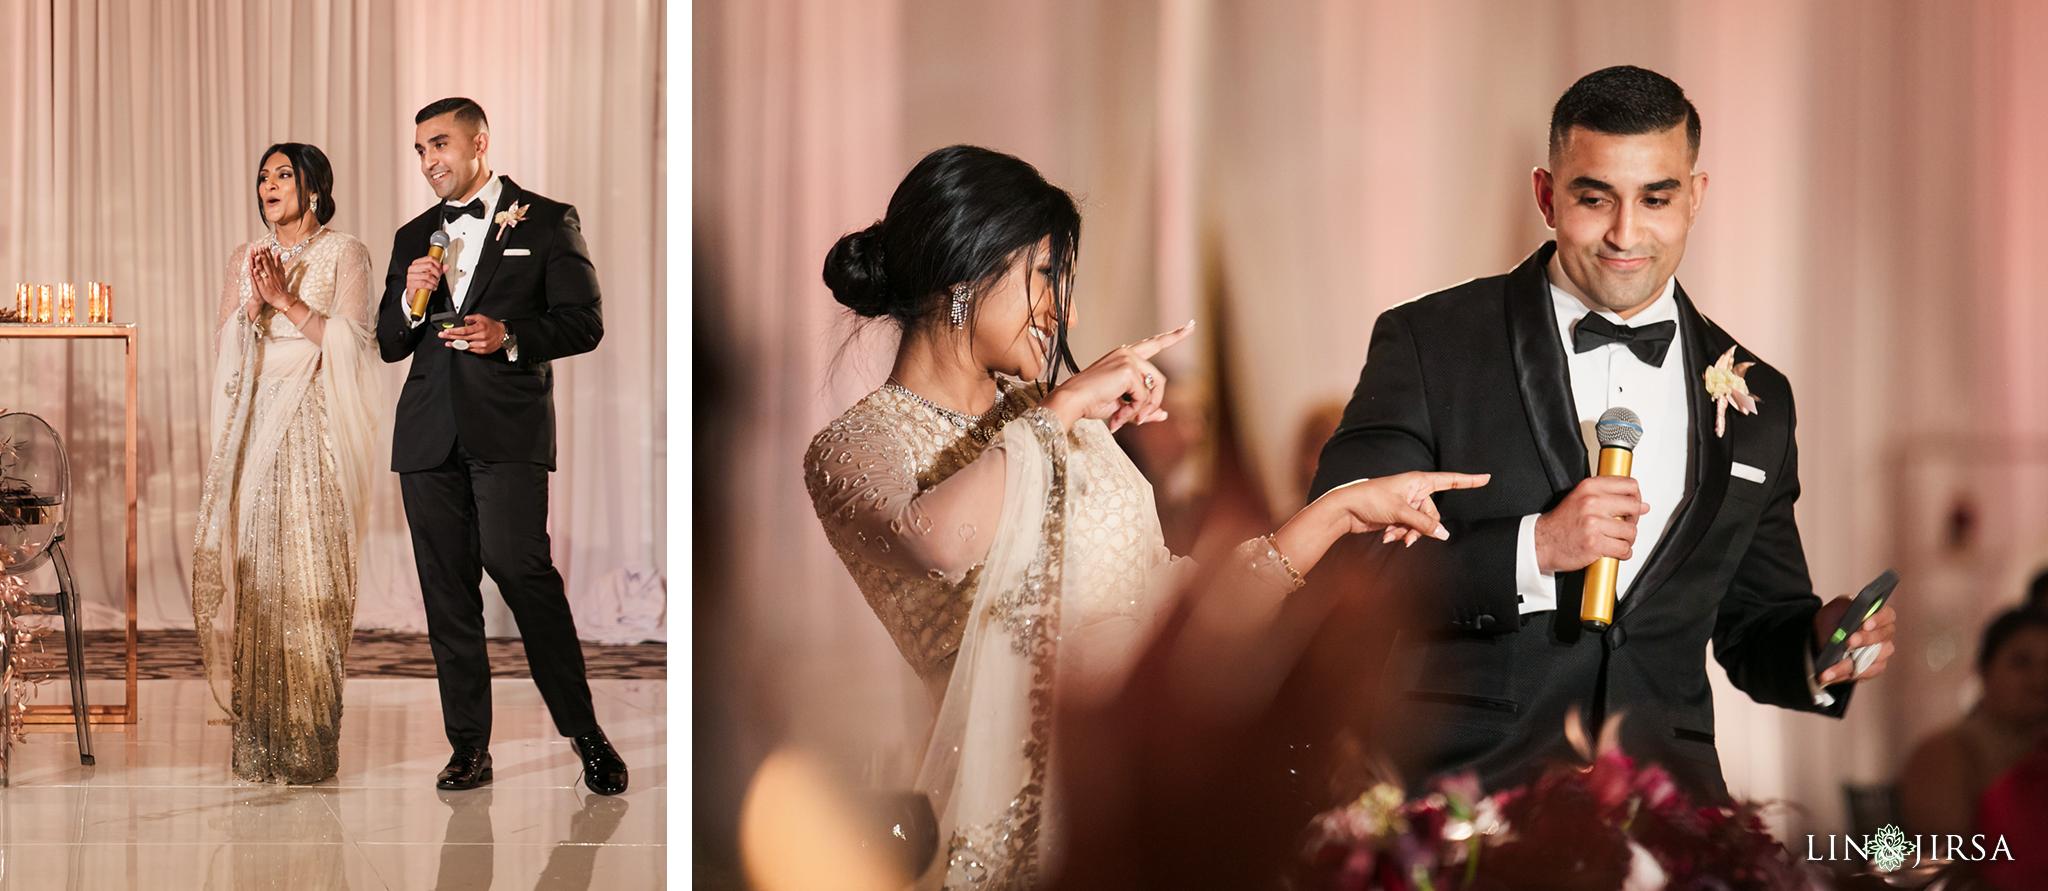 50 Monarch Beach Resort Dana Point Sri Lankan Wedding Photography